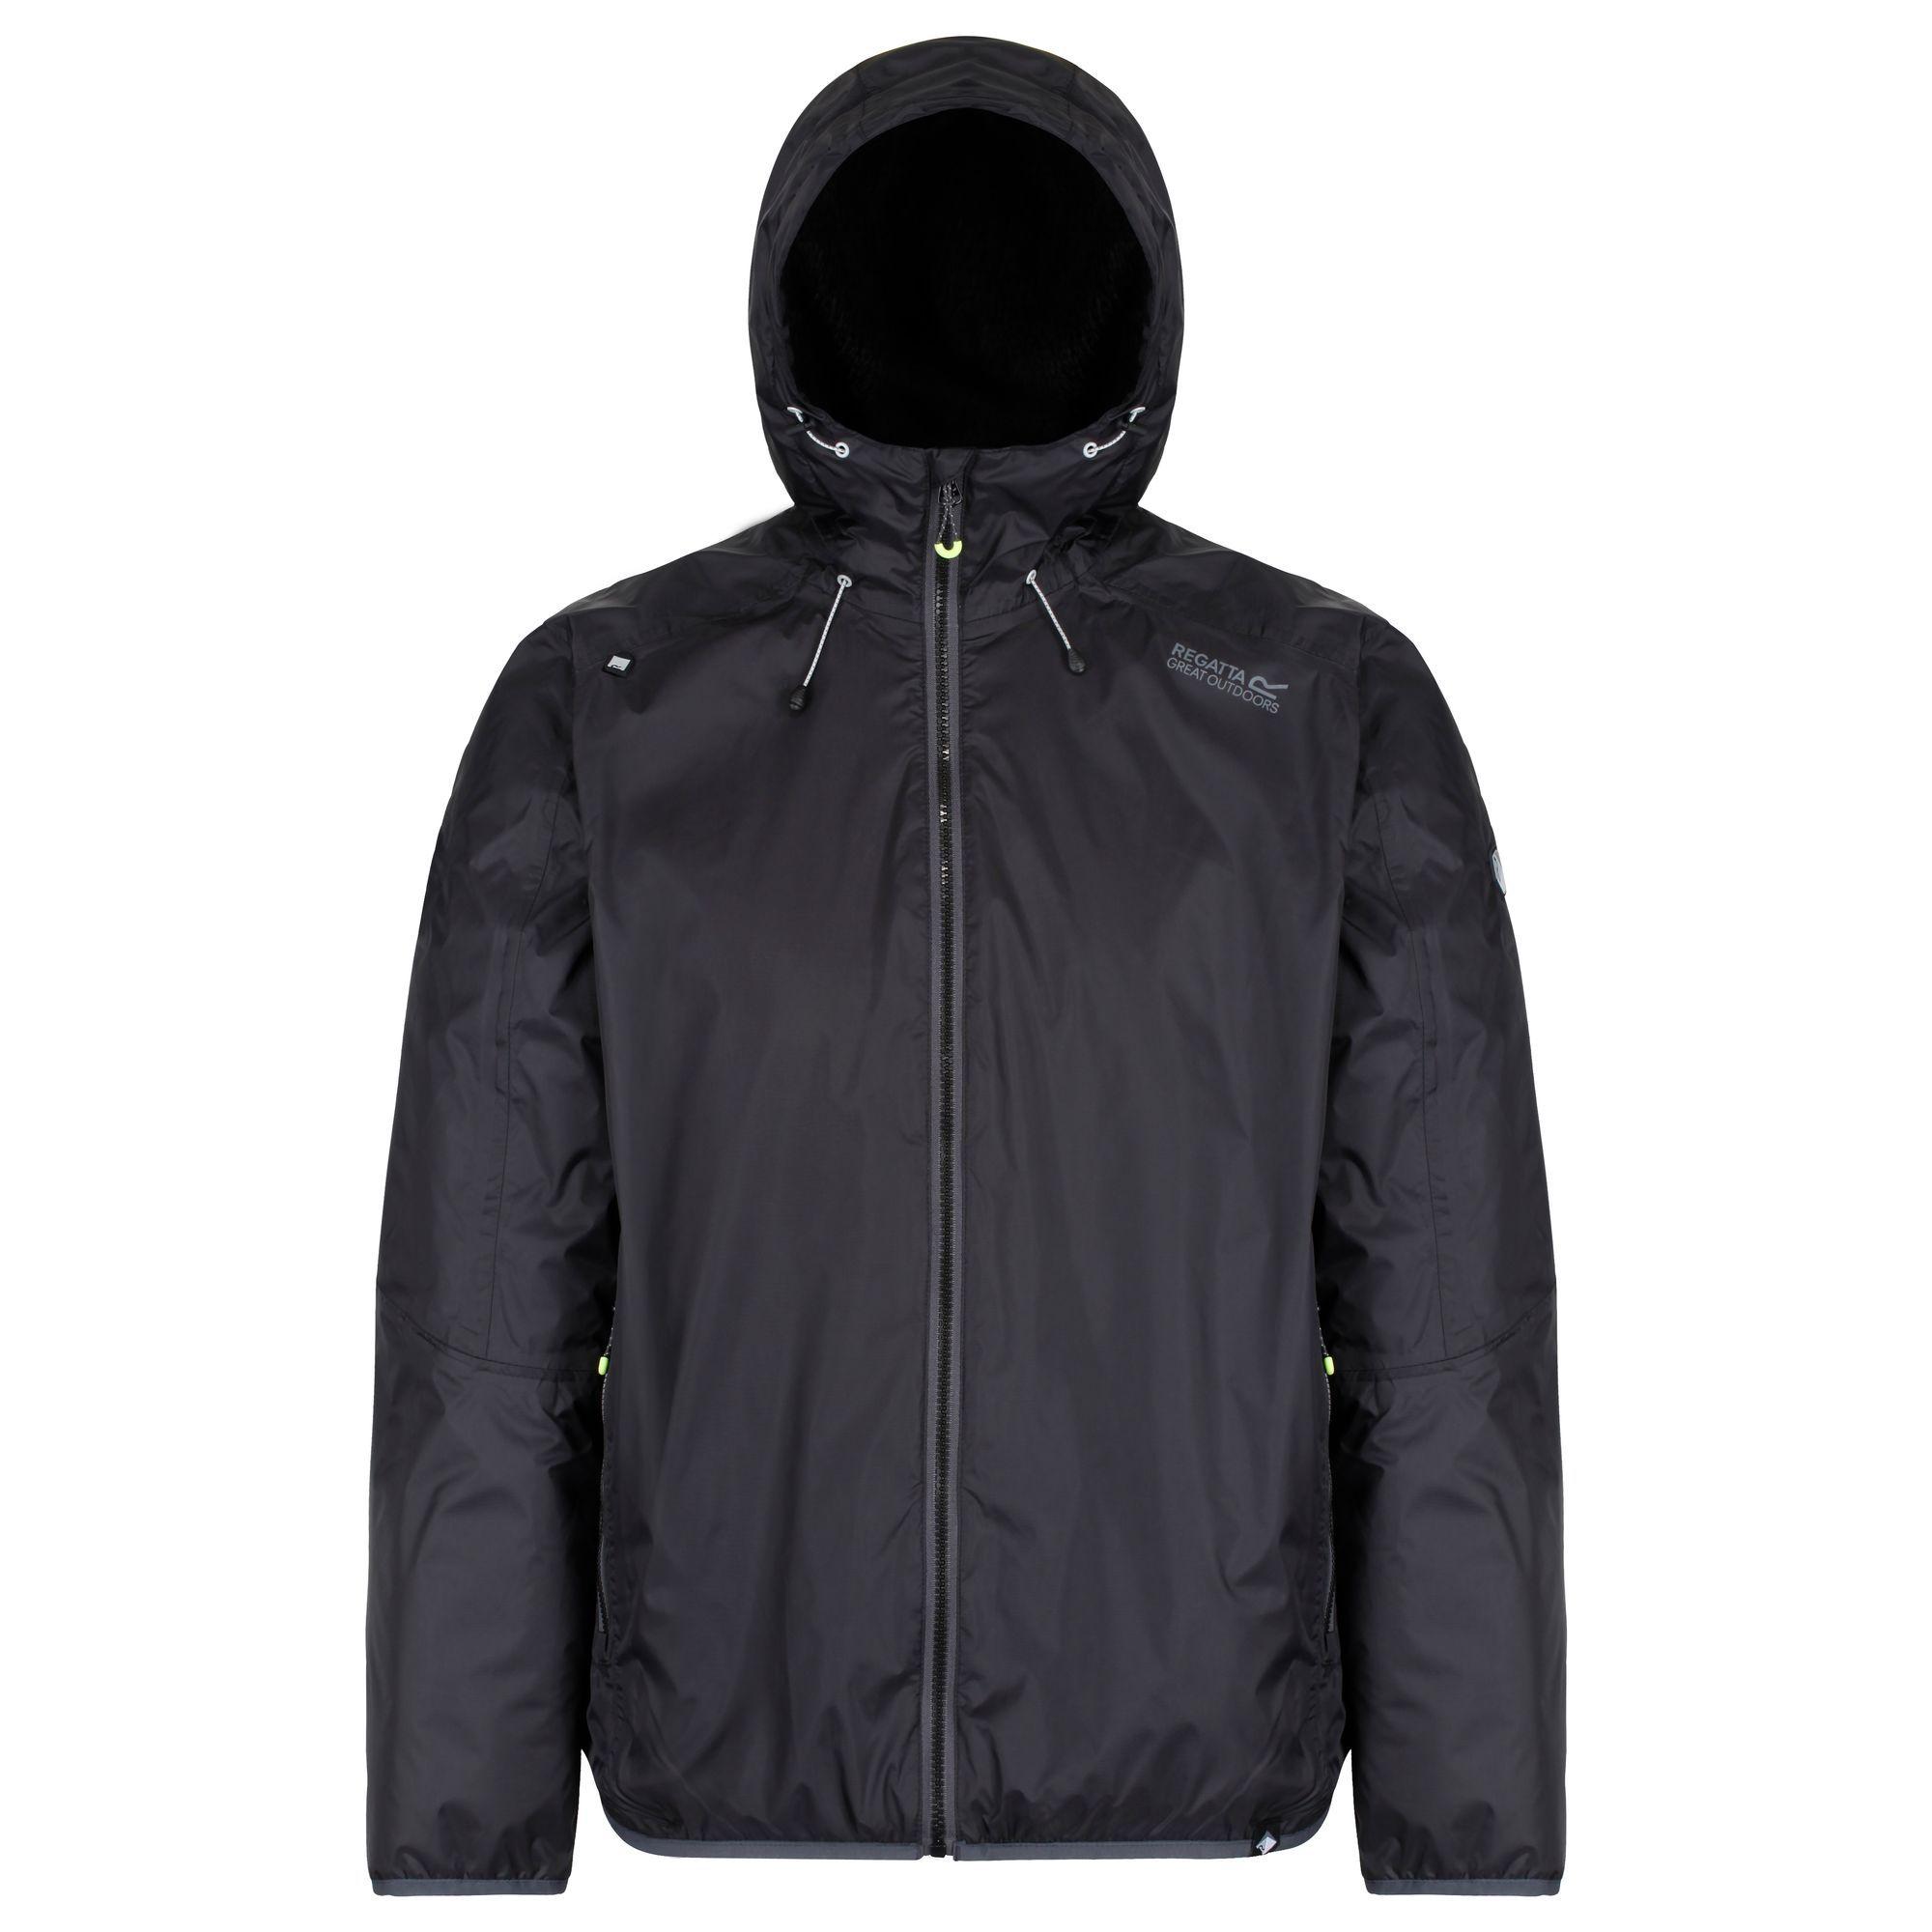 Regatta-Tarren-Mens-Wateproof-Breathable-Fleece-Lined-Jacket-RRP-70 thumbnail 4